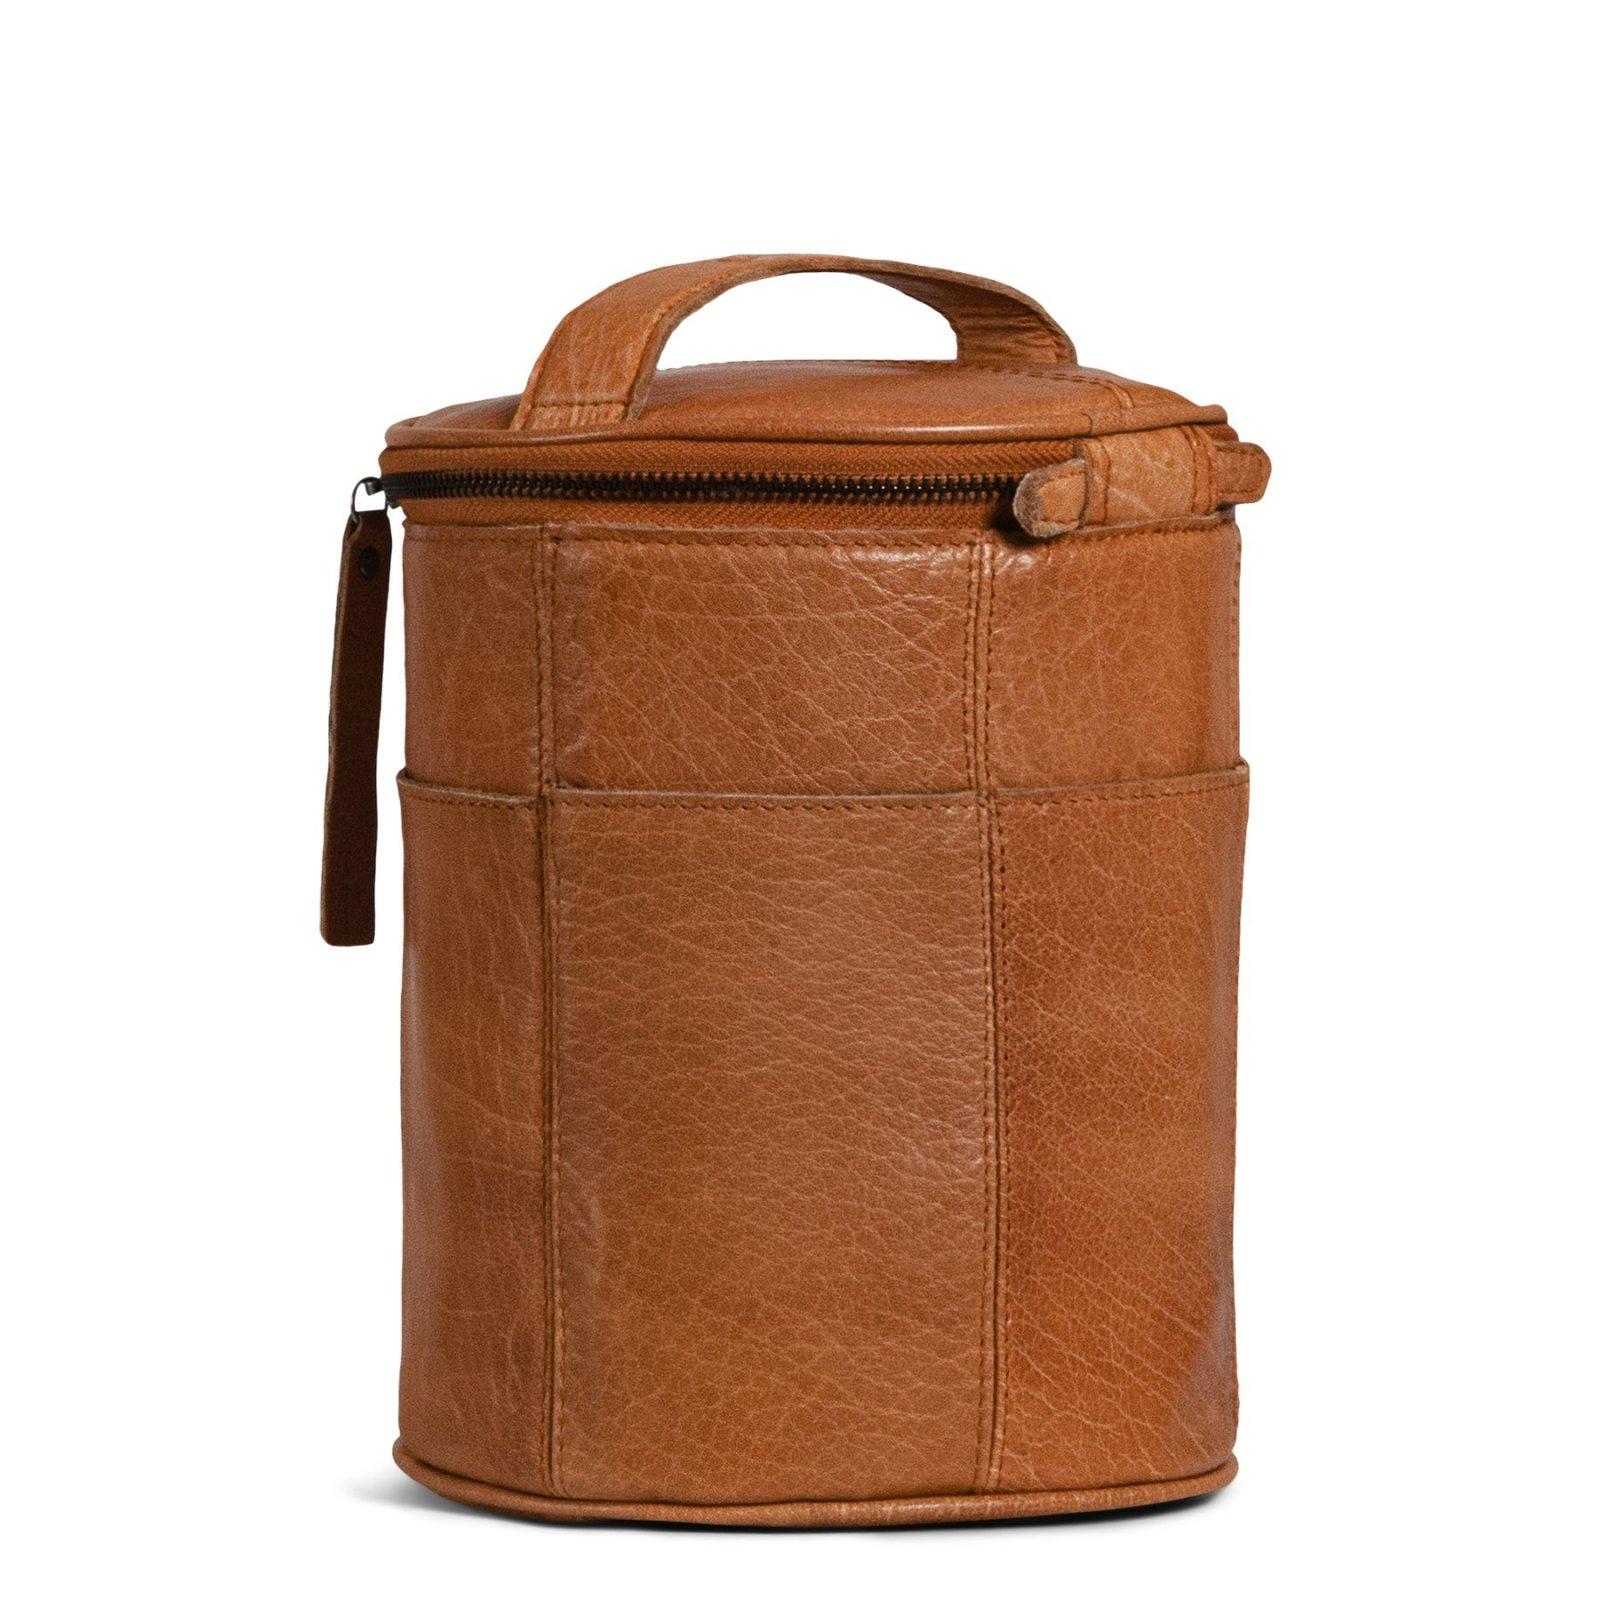 Muud Leather Bags